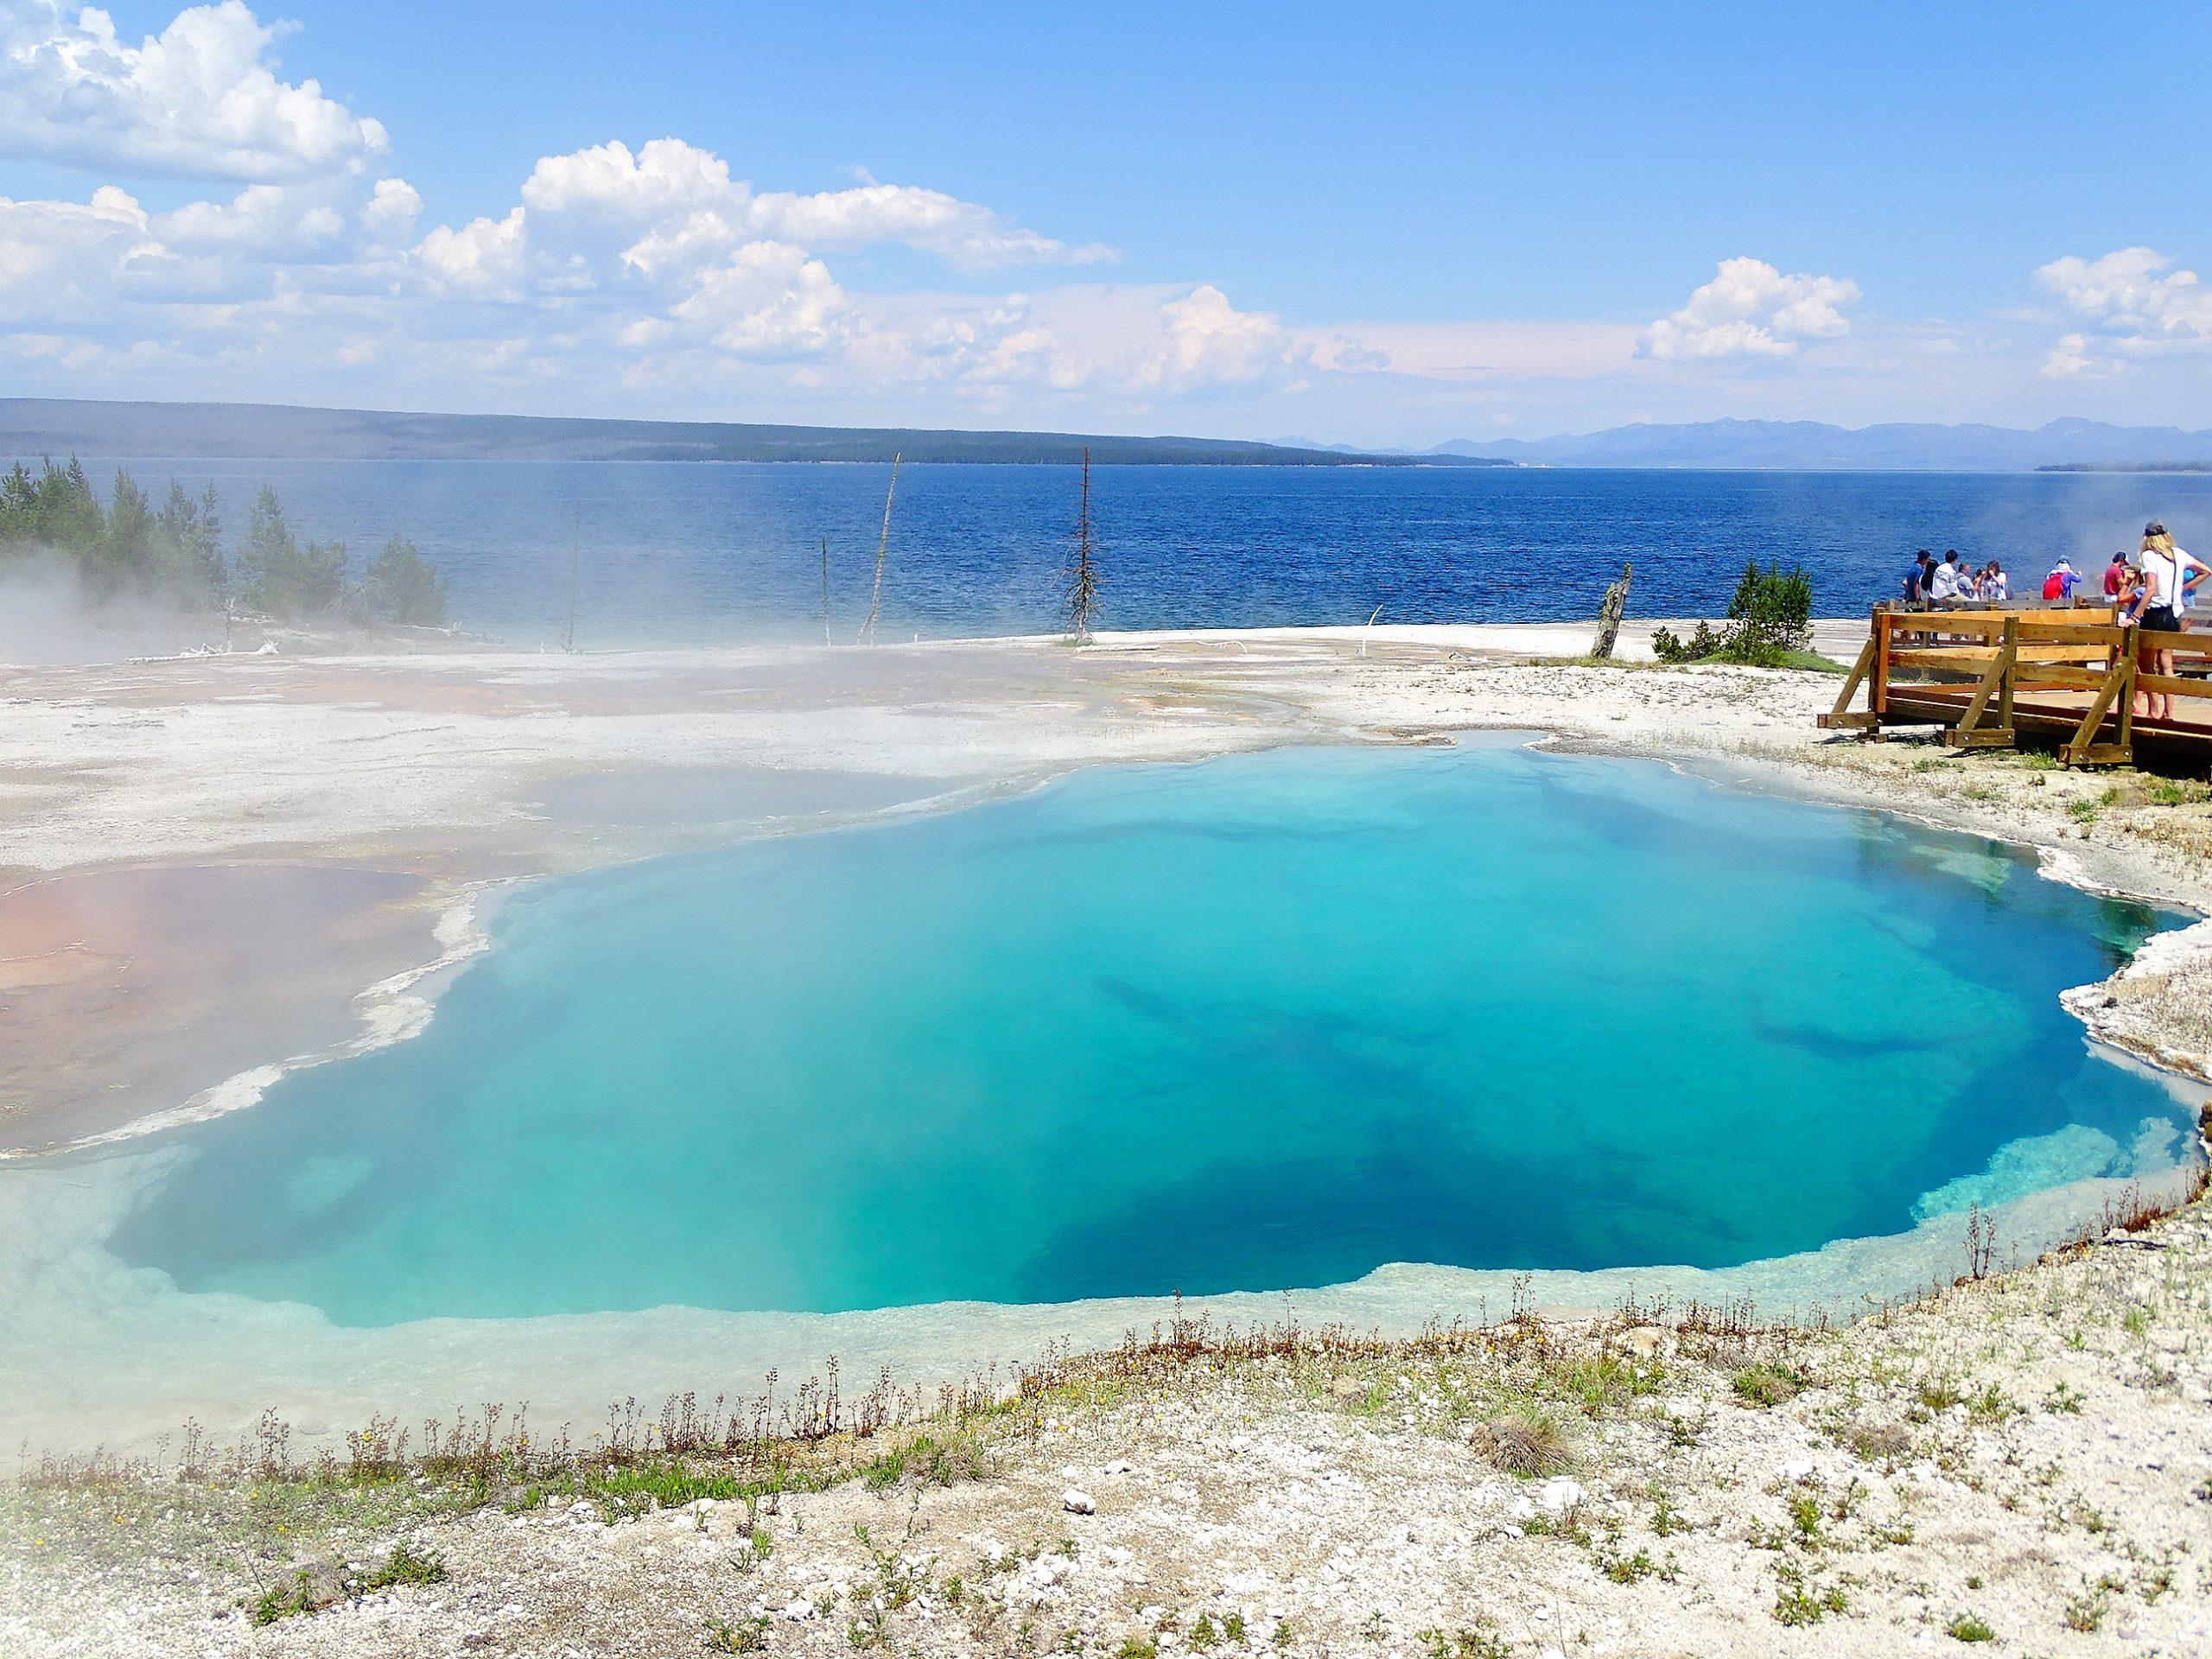 Laguna 03 con Lago Yellostone y borde caldera